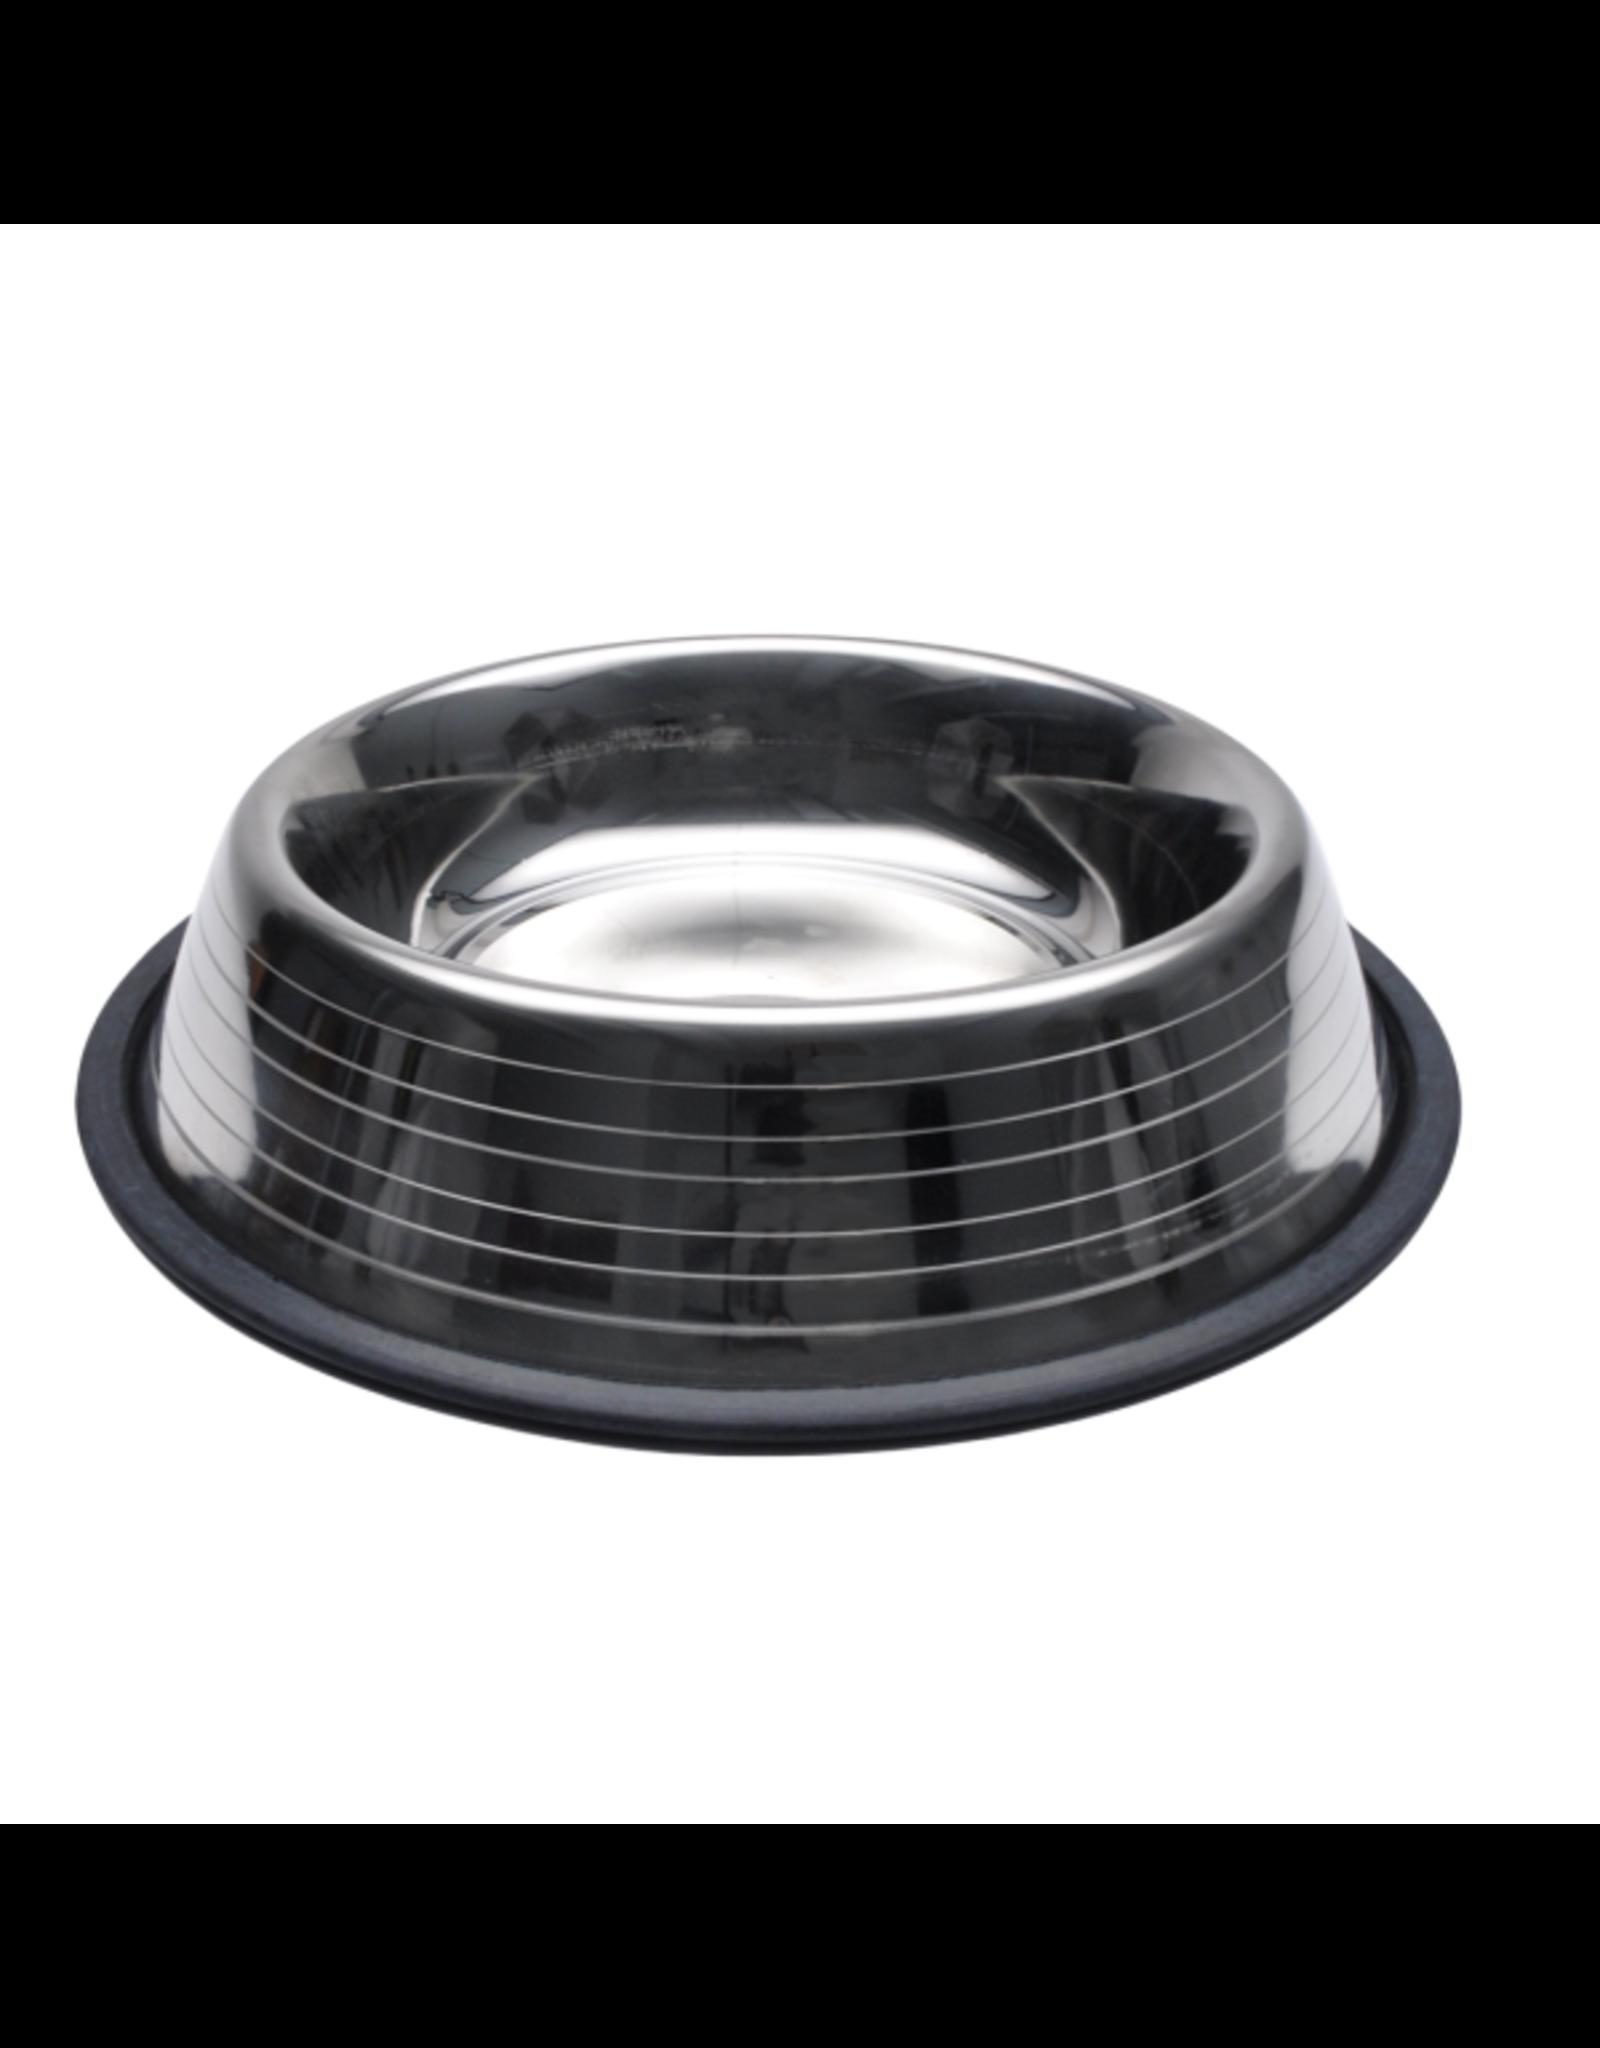 Coastal Pet Products Coastal Non-Skid Stainless Steel Bowl w/ Ridges